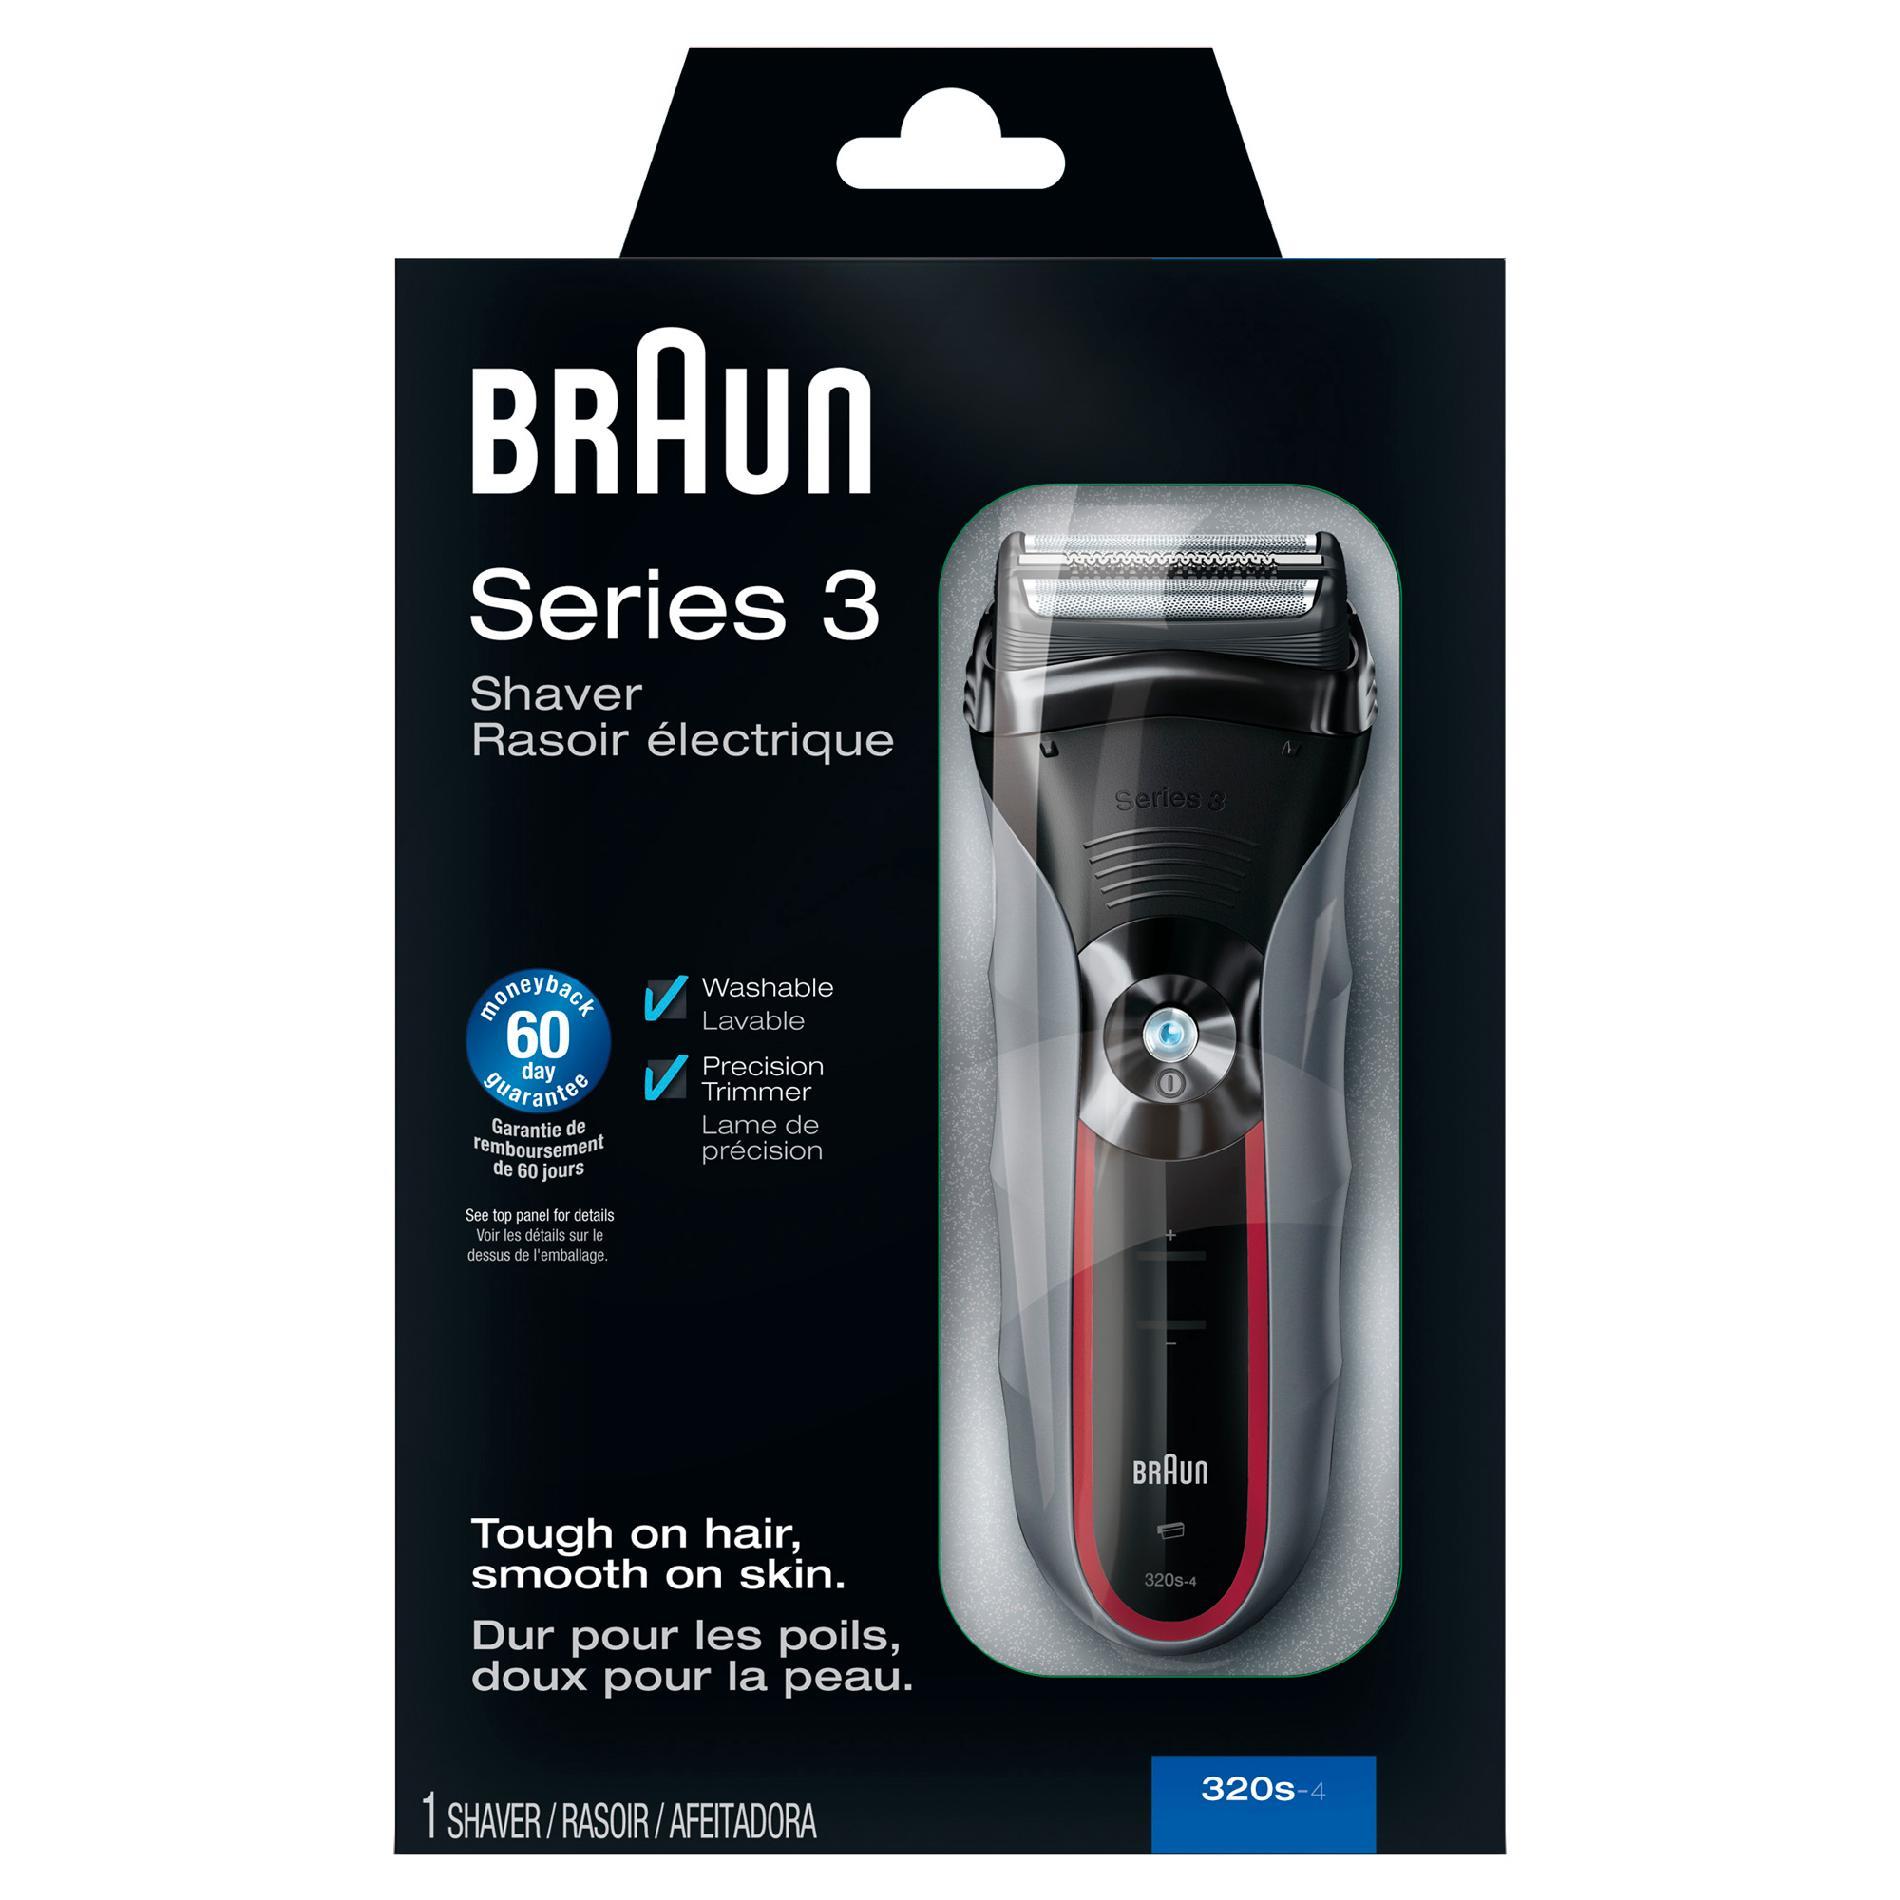 Braun 3 Series 320 S-4 Shaver